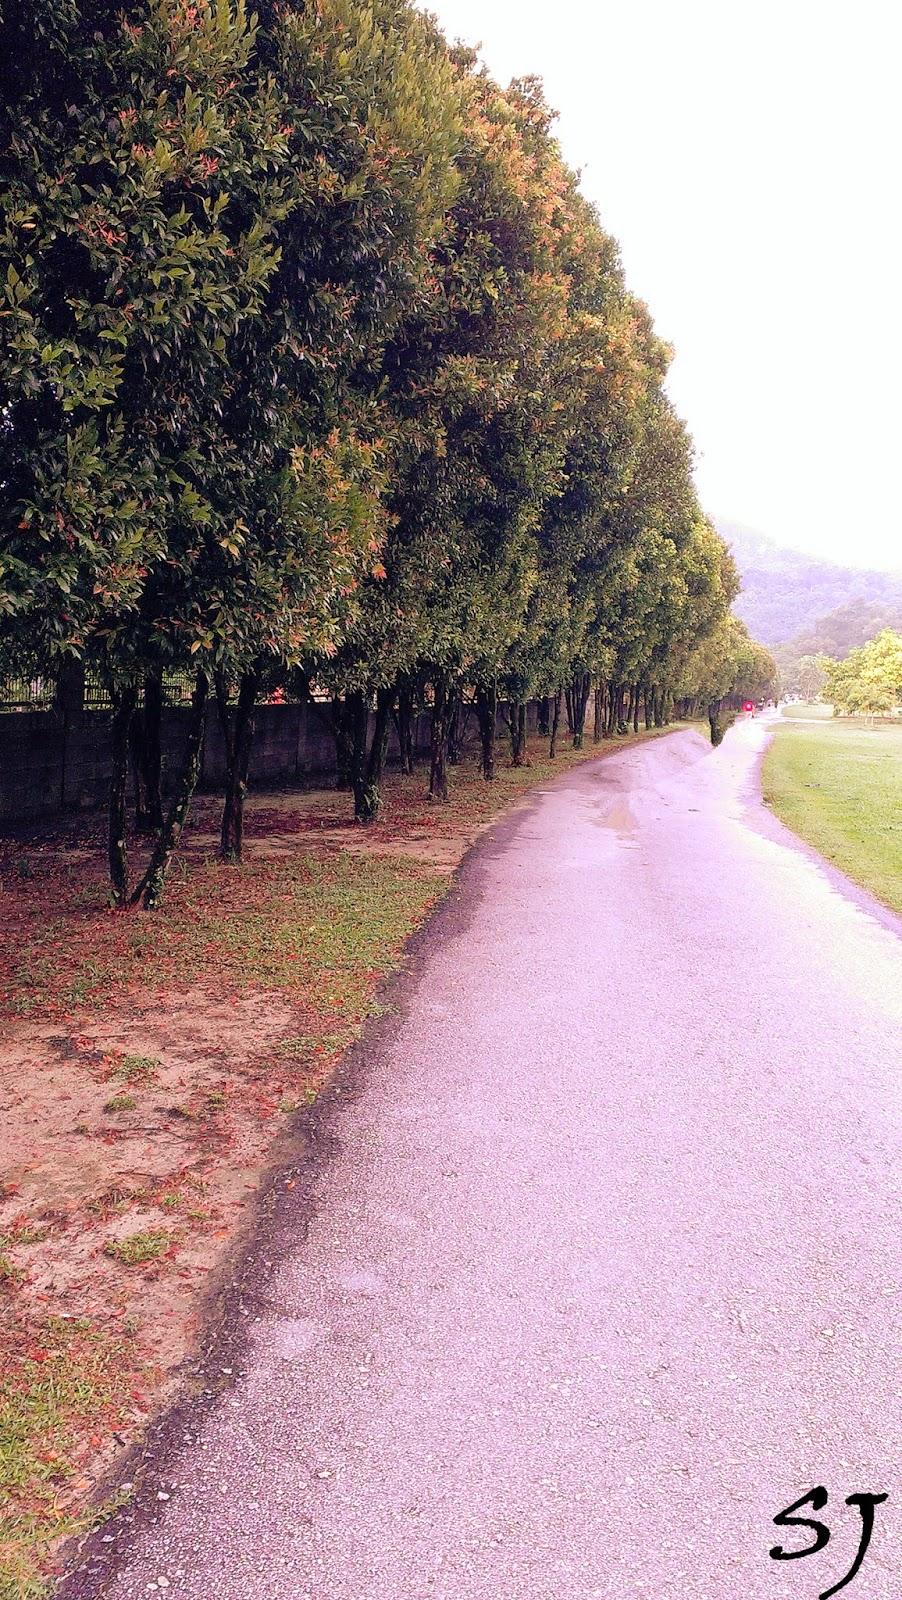 trees;garden;botanic garden